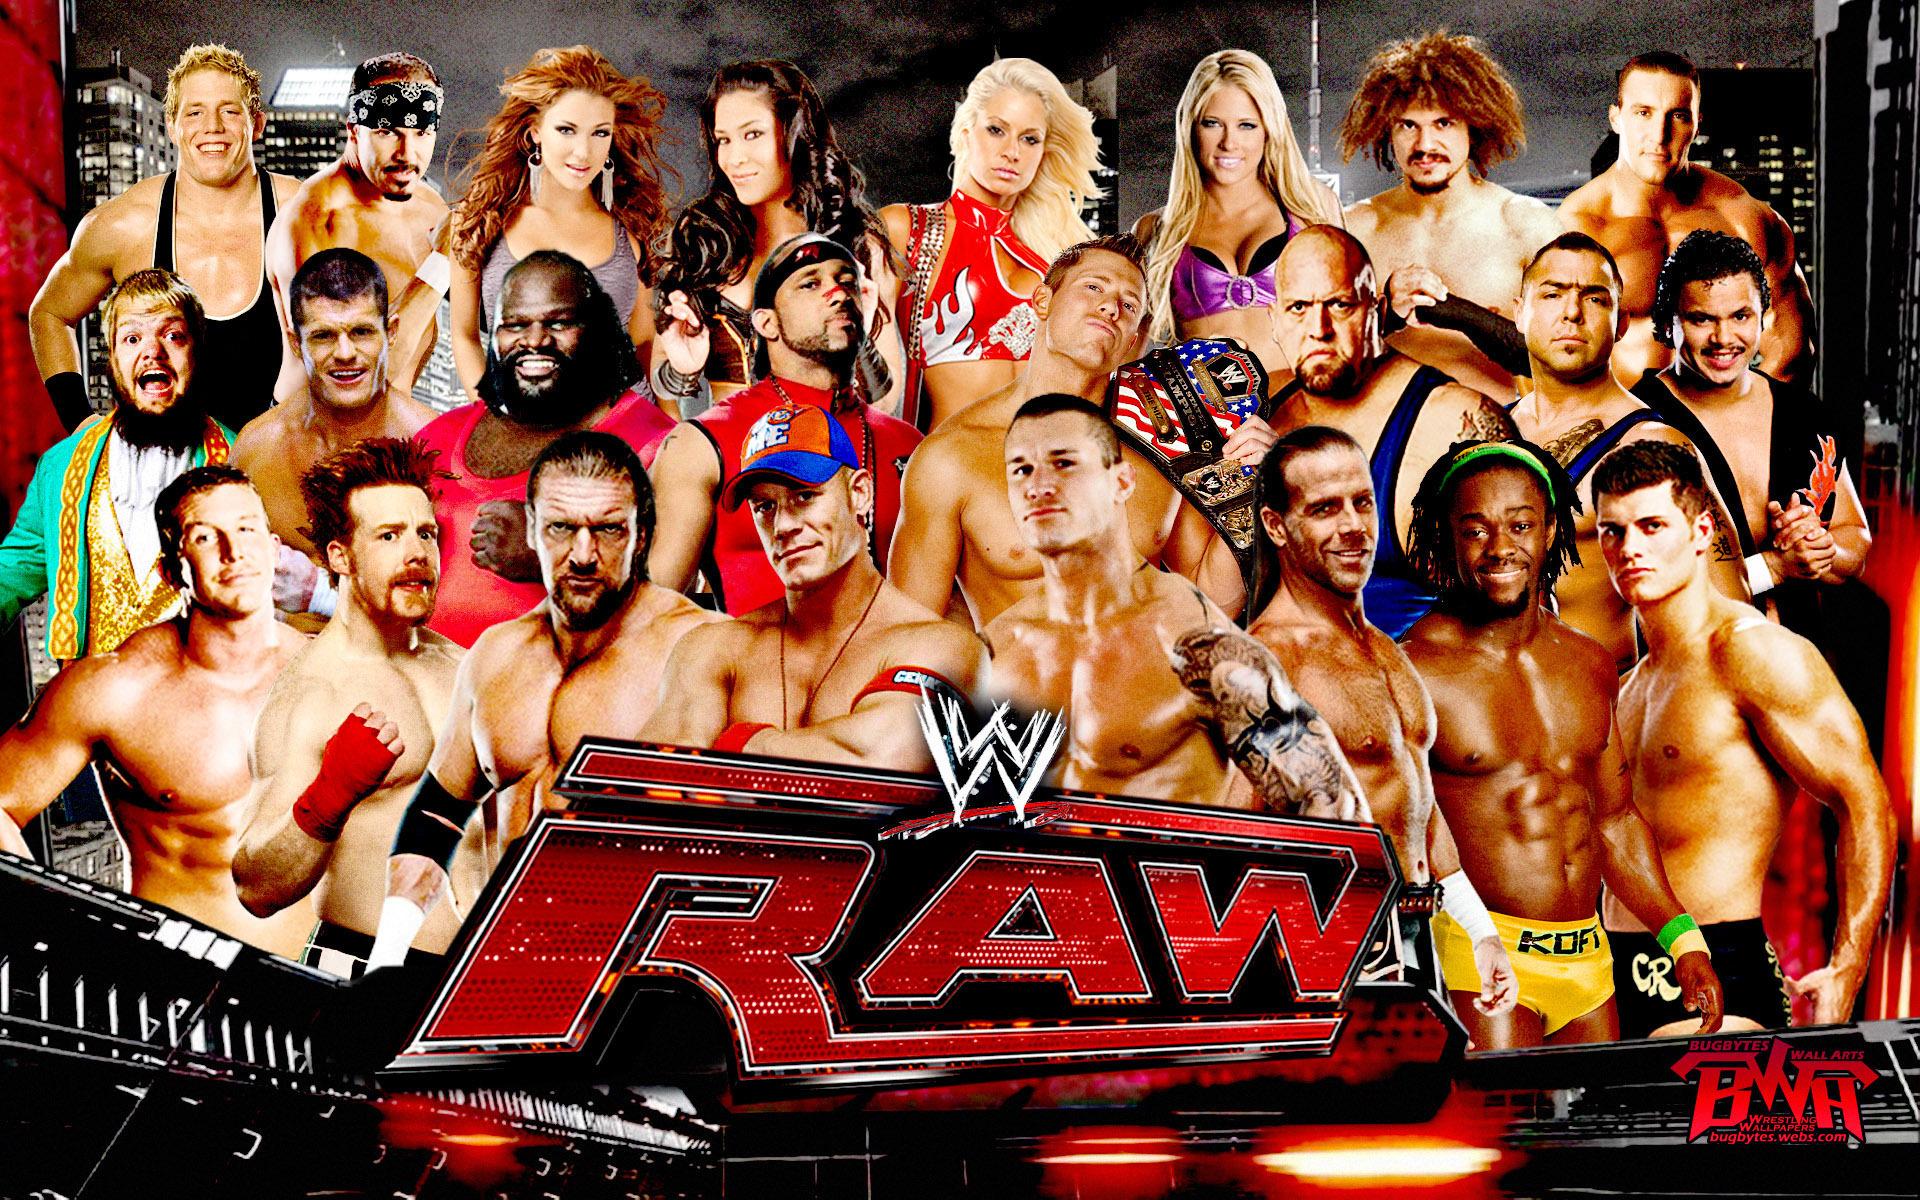 WWE images WWE Raw wallpaper photos 16933808 1920x1200